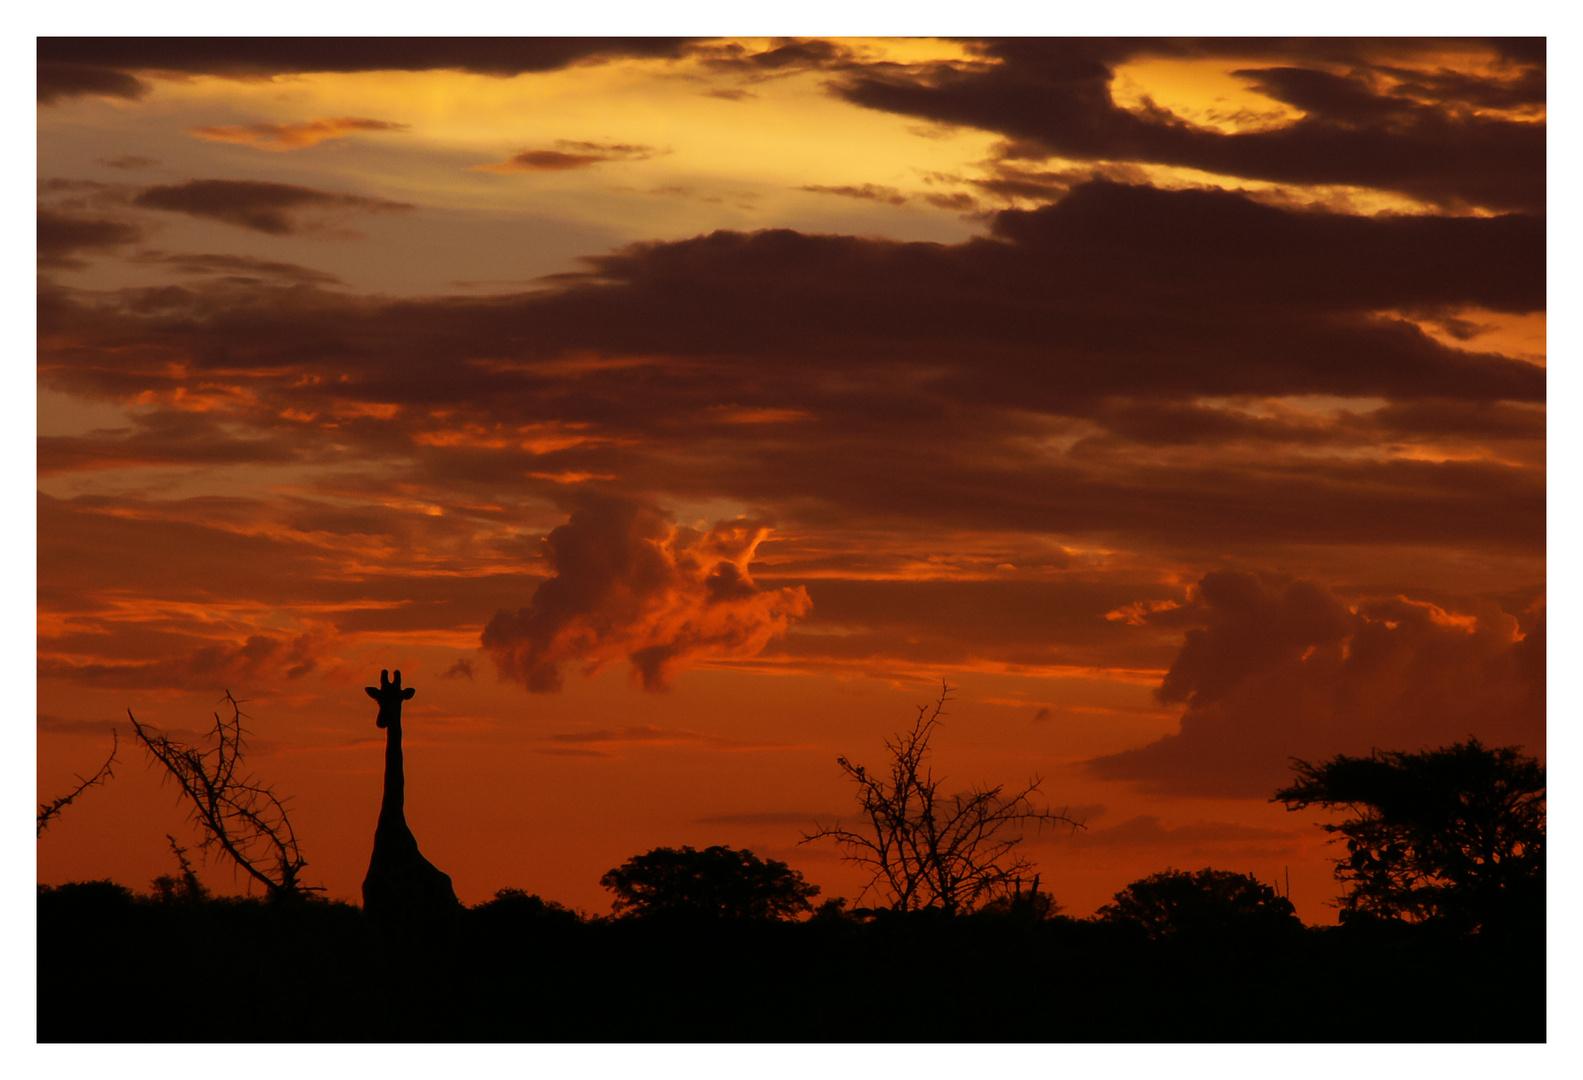 Sonnenuntergang im Etosha National Park, Namibia